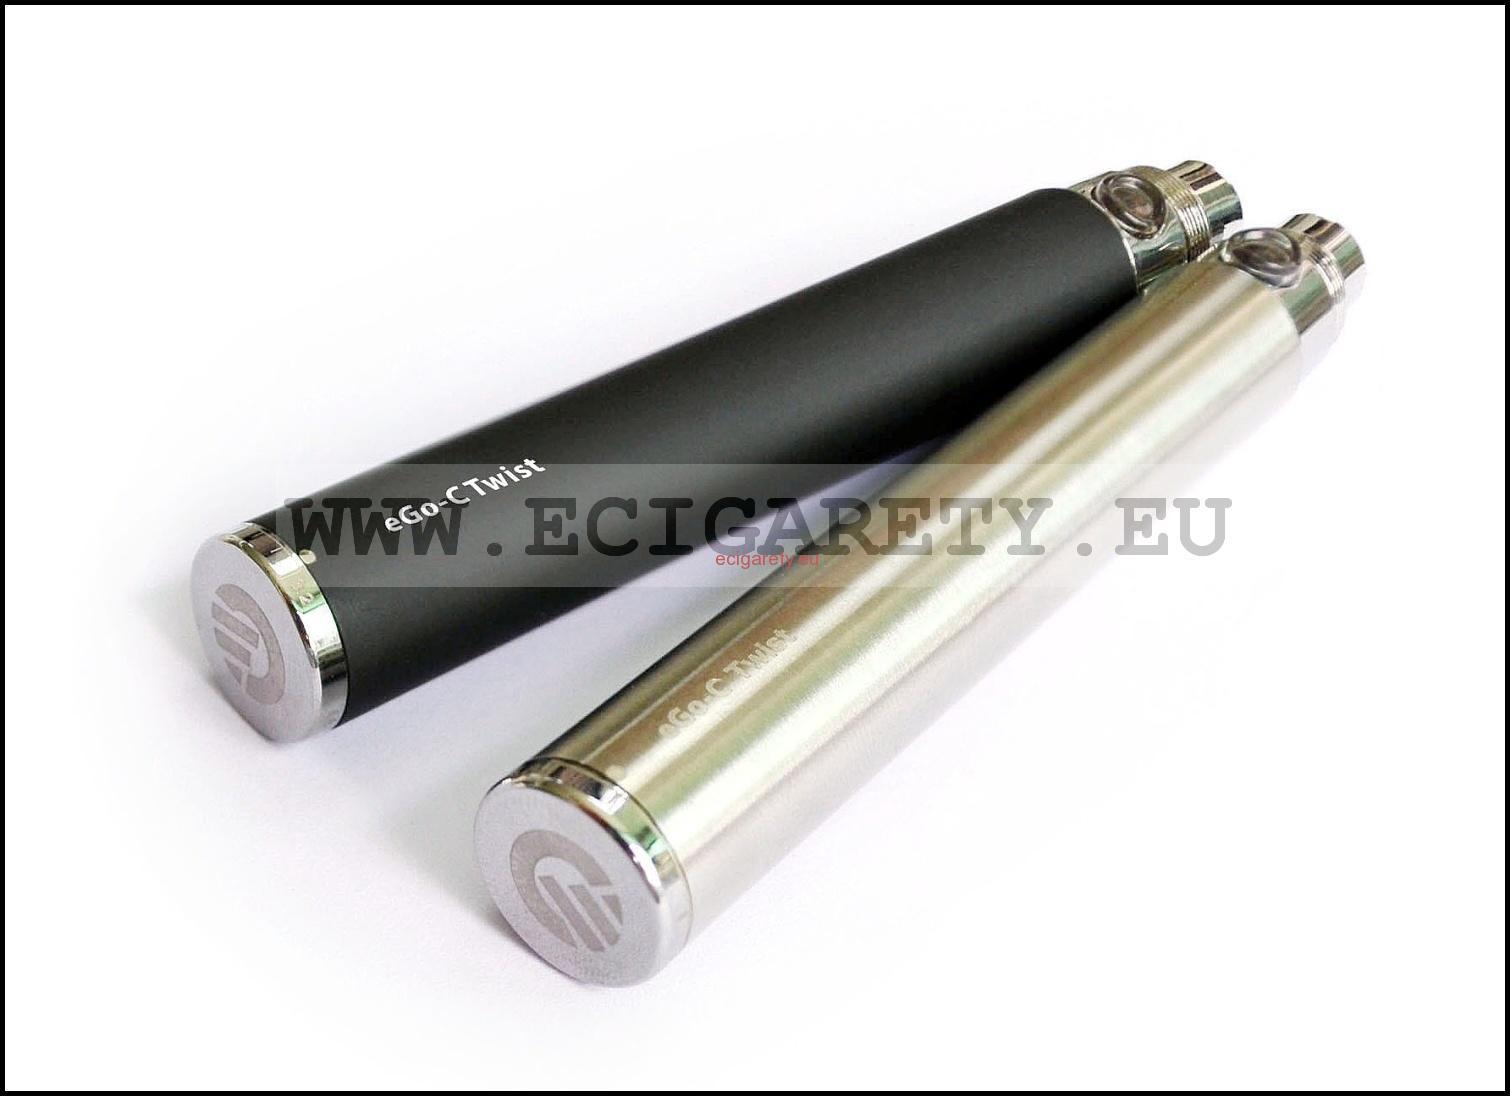 Joyetech baterie eGo-C TWIST 650mAh- černá